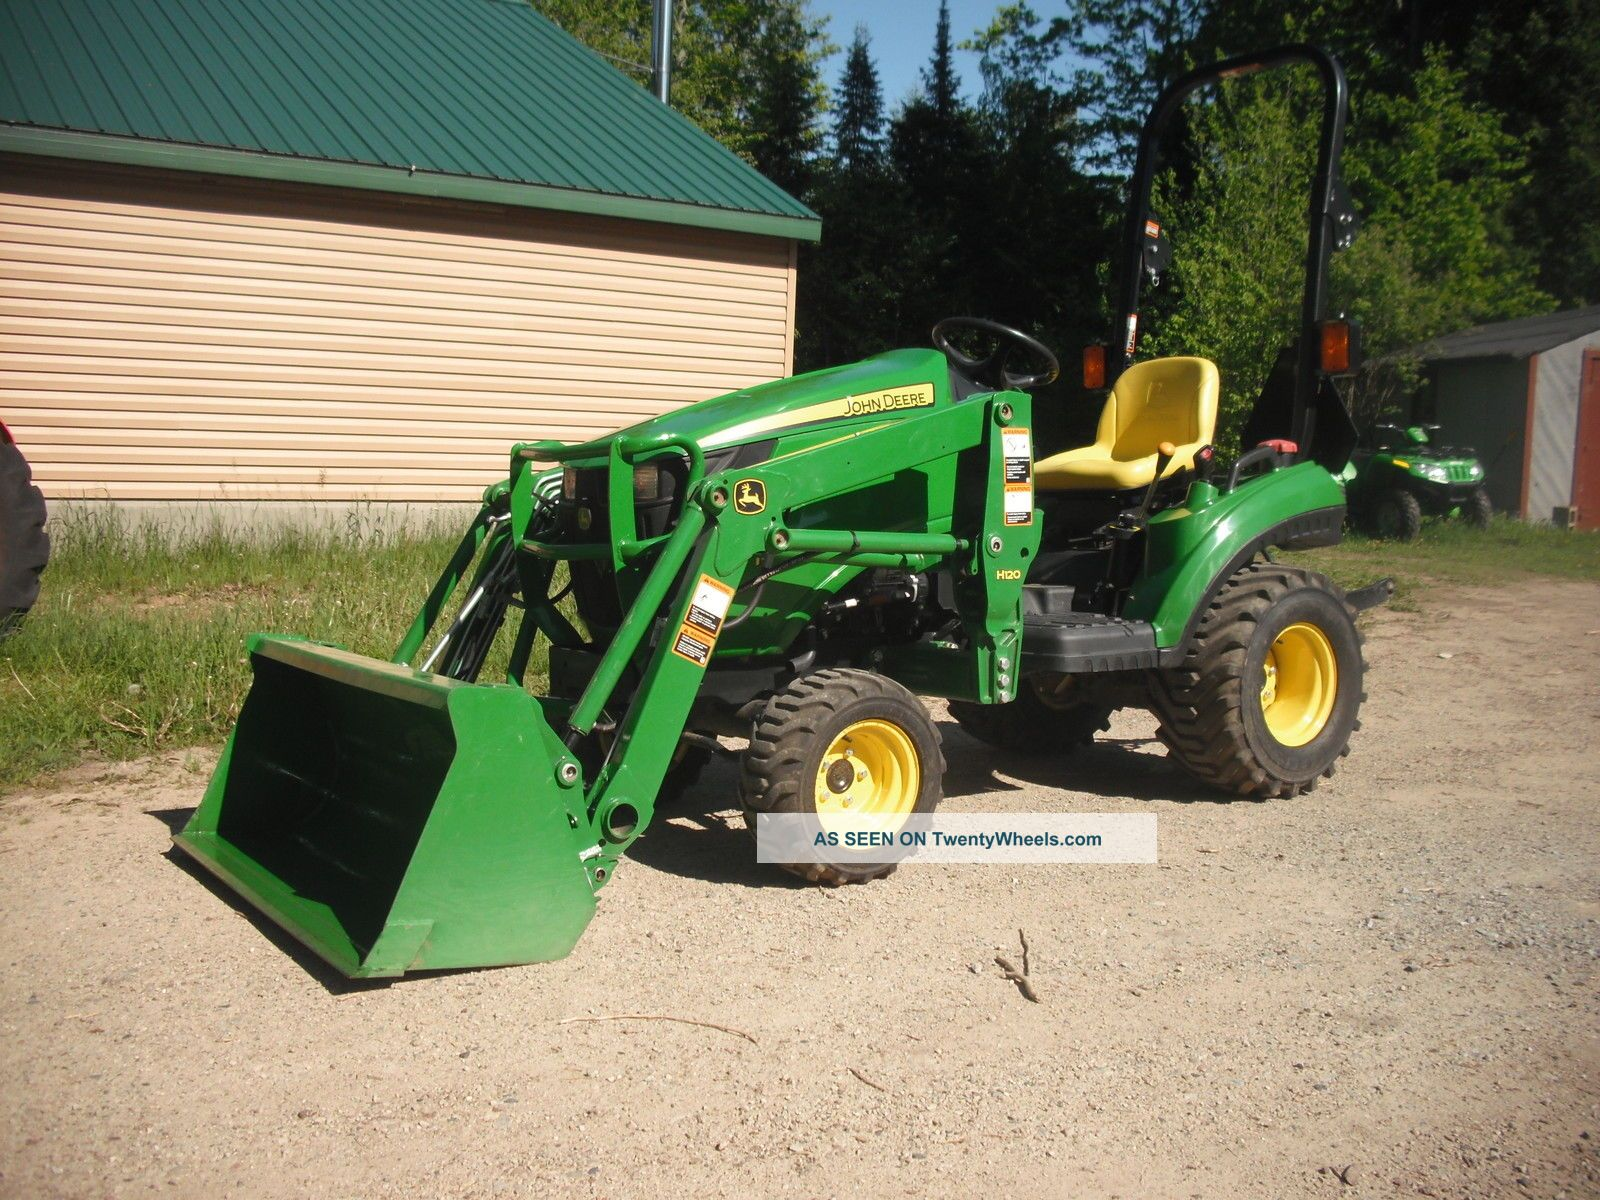 John Deere Compact Tractor Attachments : John deere e loader compact tractor